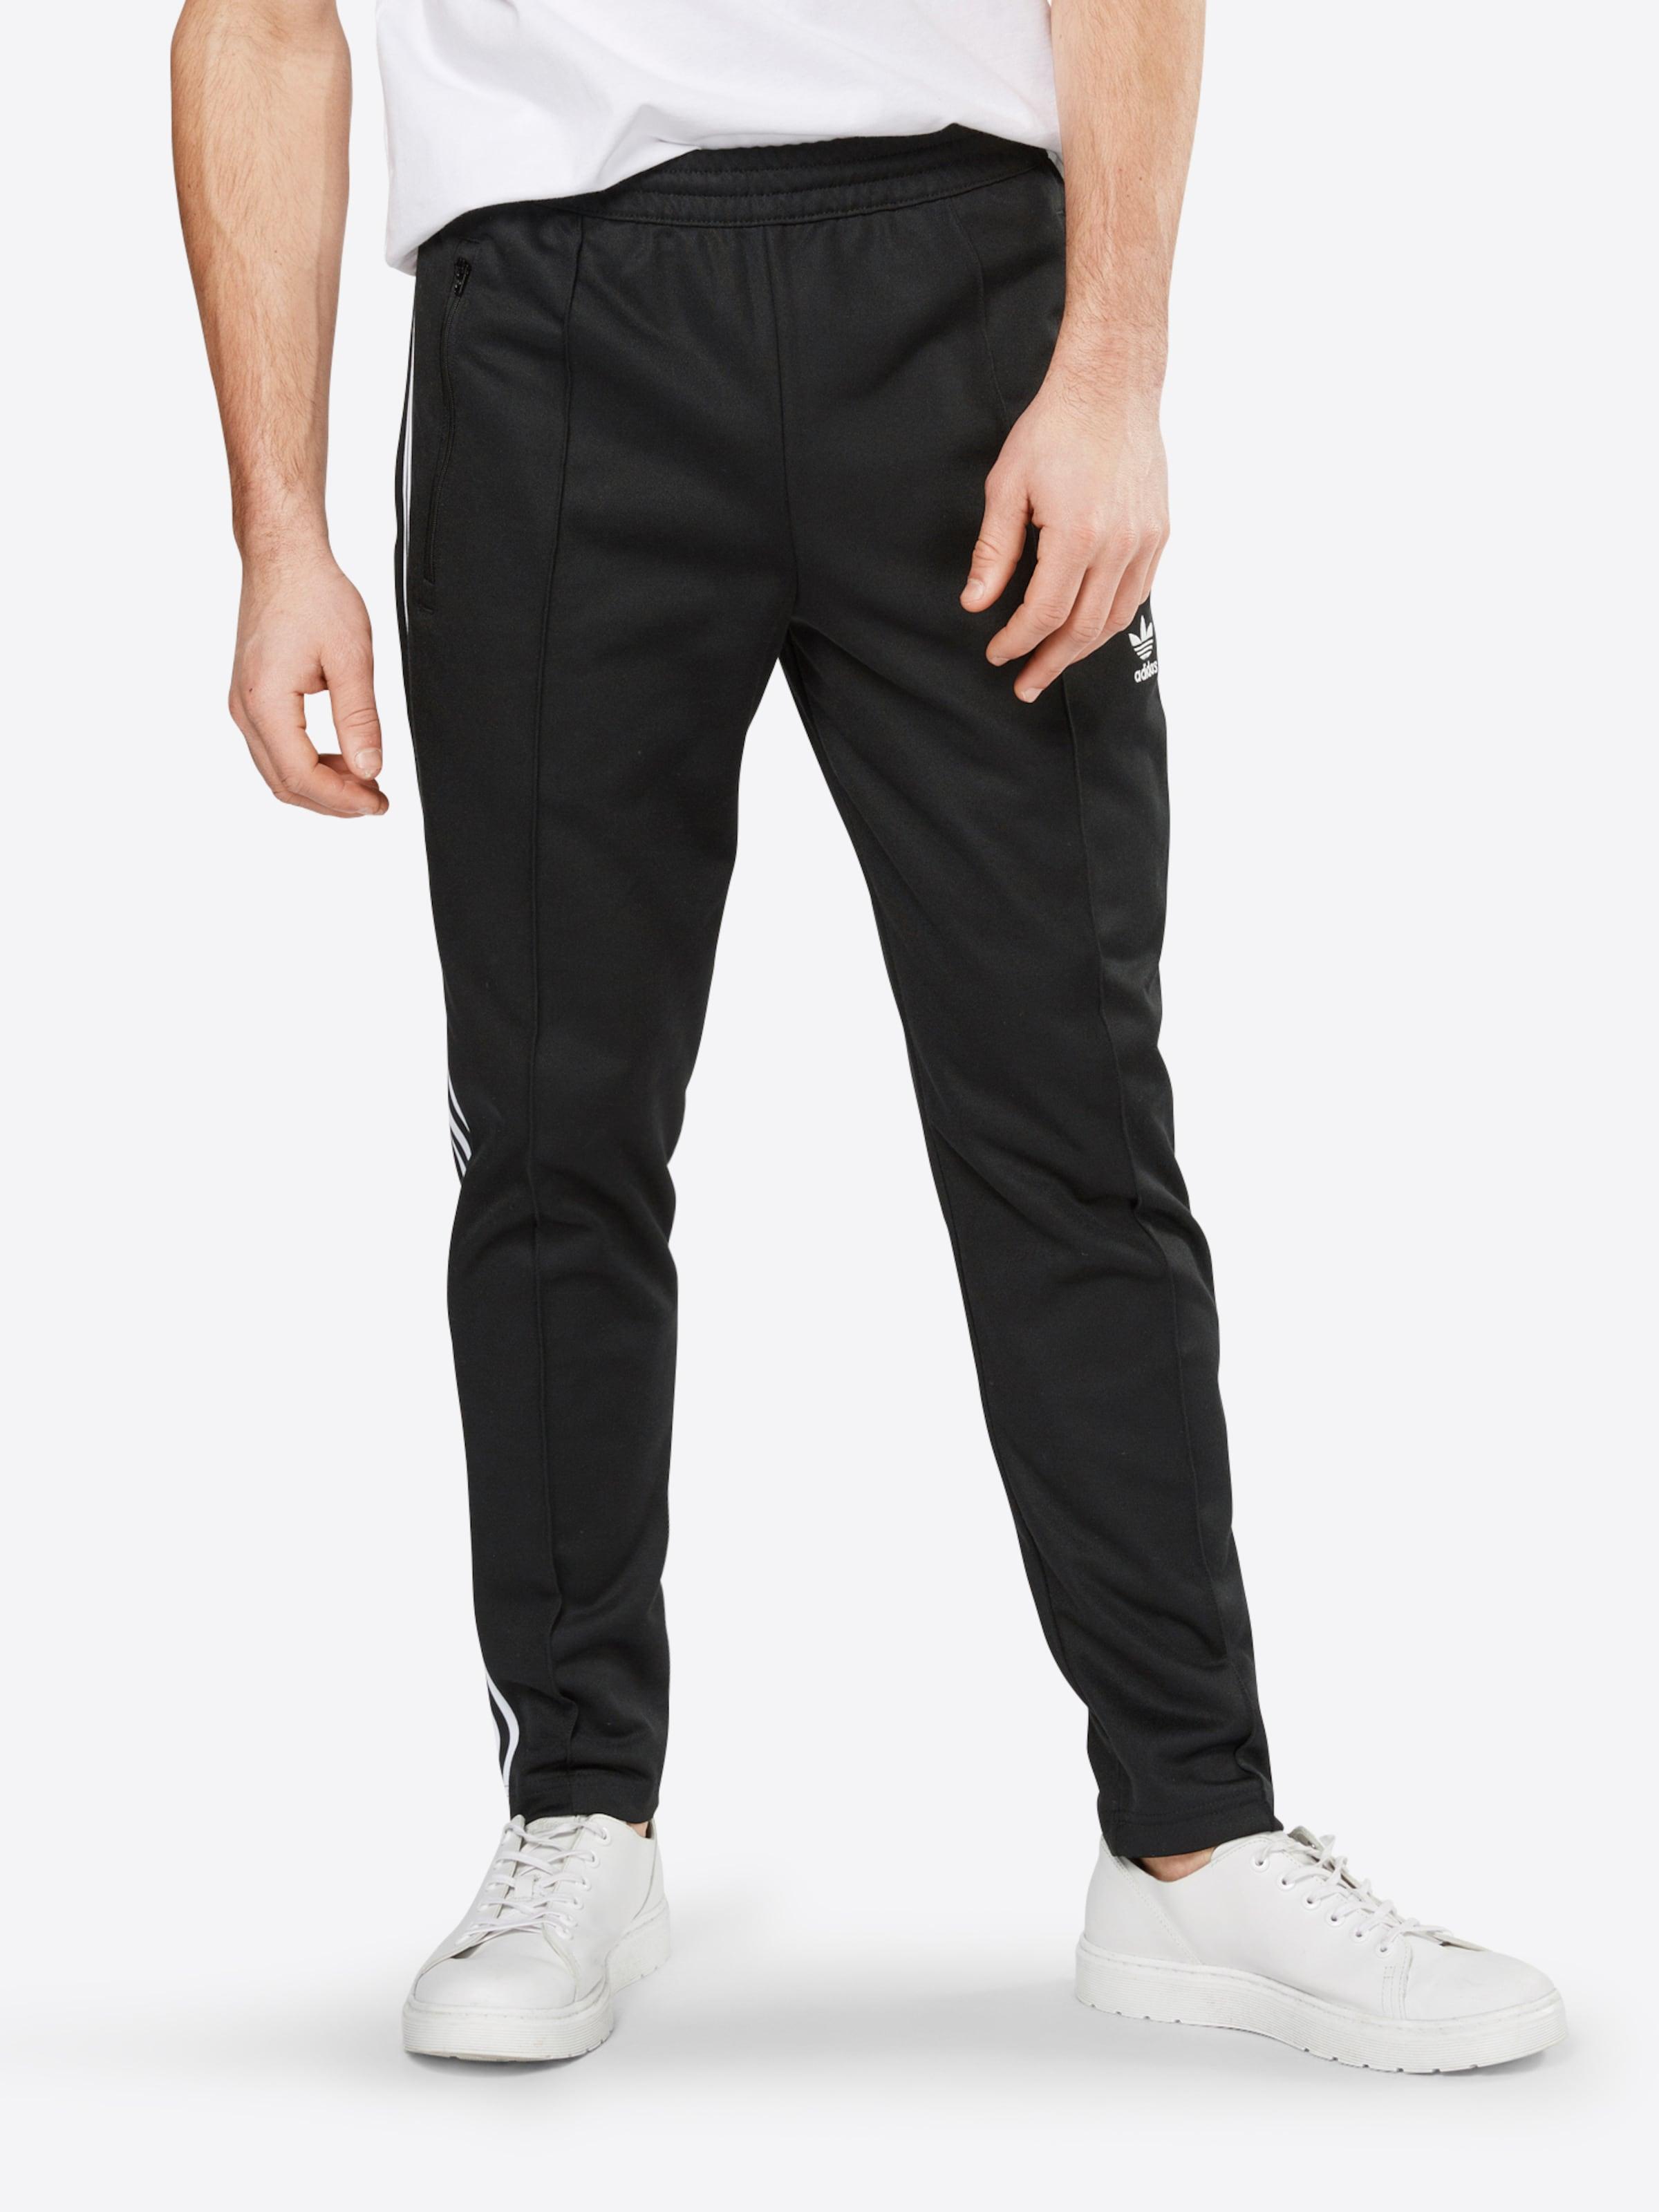 Originals Originals En Adidas Pantalon Adidas NoirBlanc En NoirBlanc Pantalon Adidas Originals WHED9IYe2b